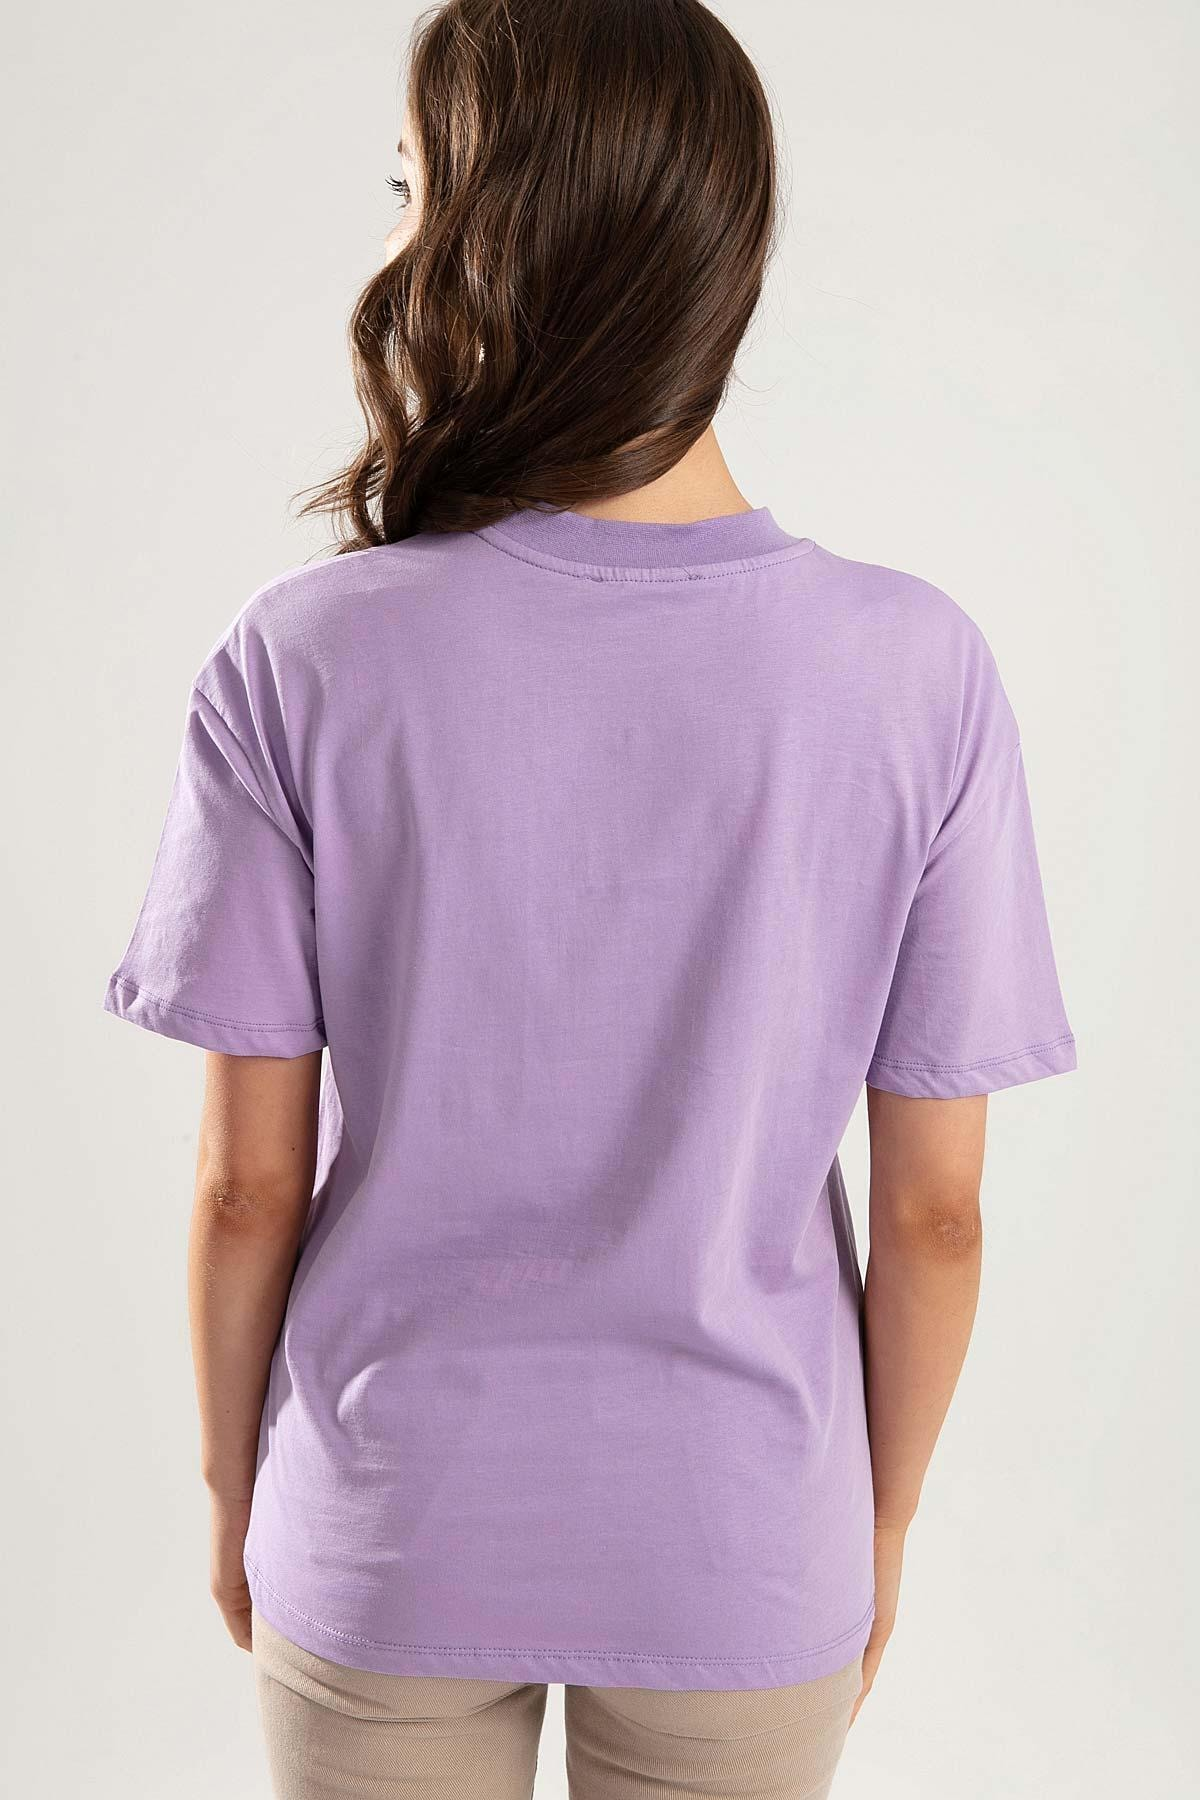 Pattaya Kadın Lila Dik Yaka Basic Tişört PTTY20S-701 3